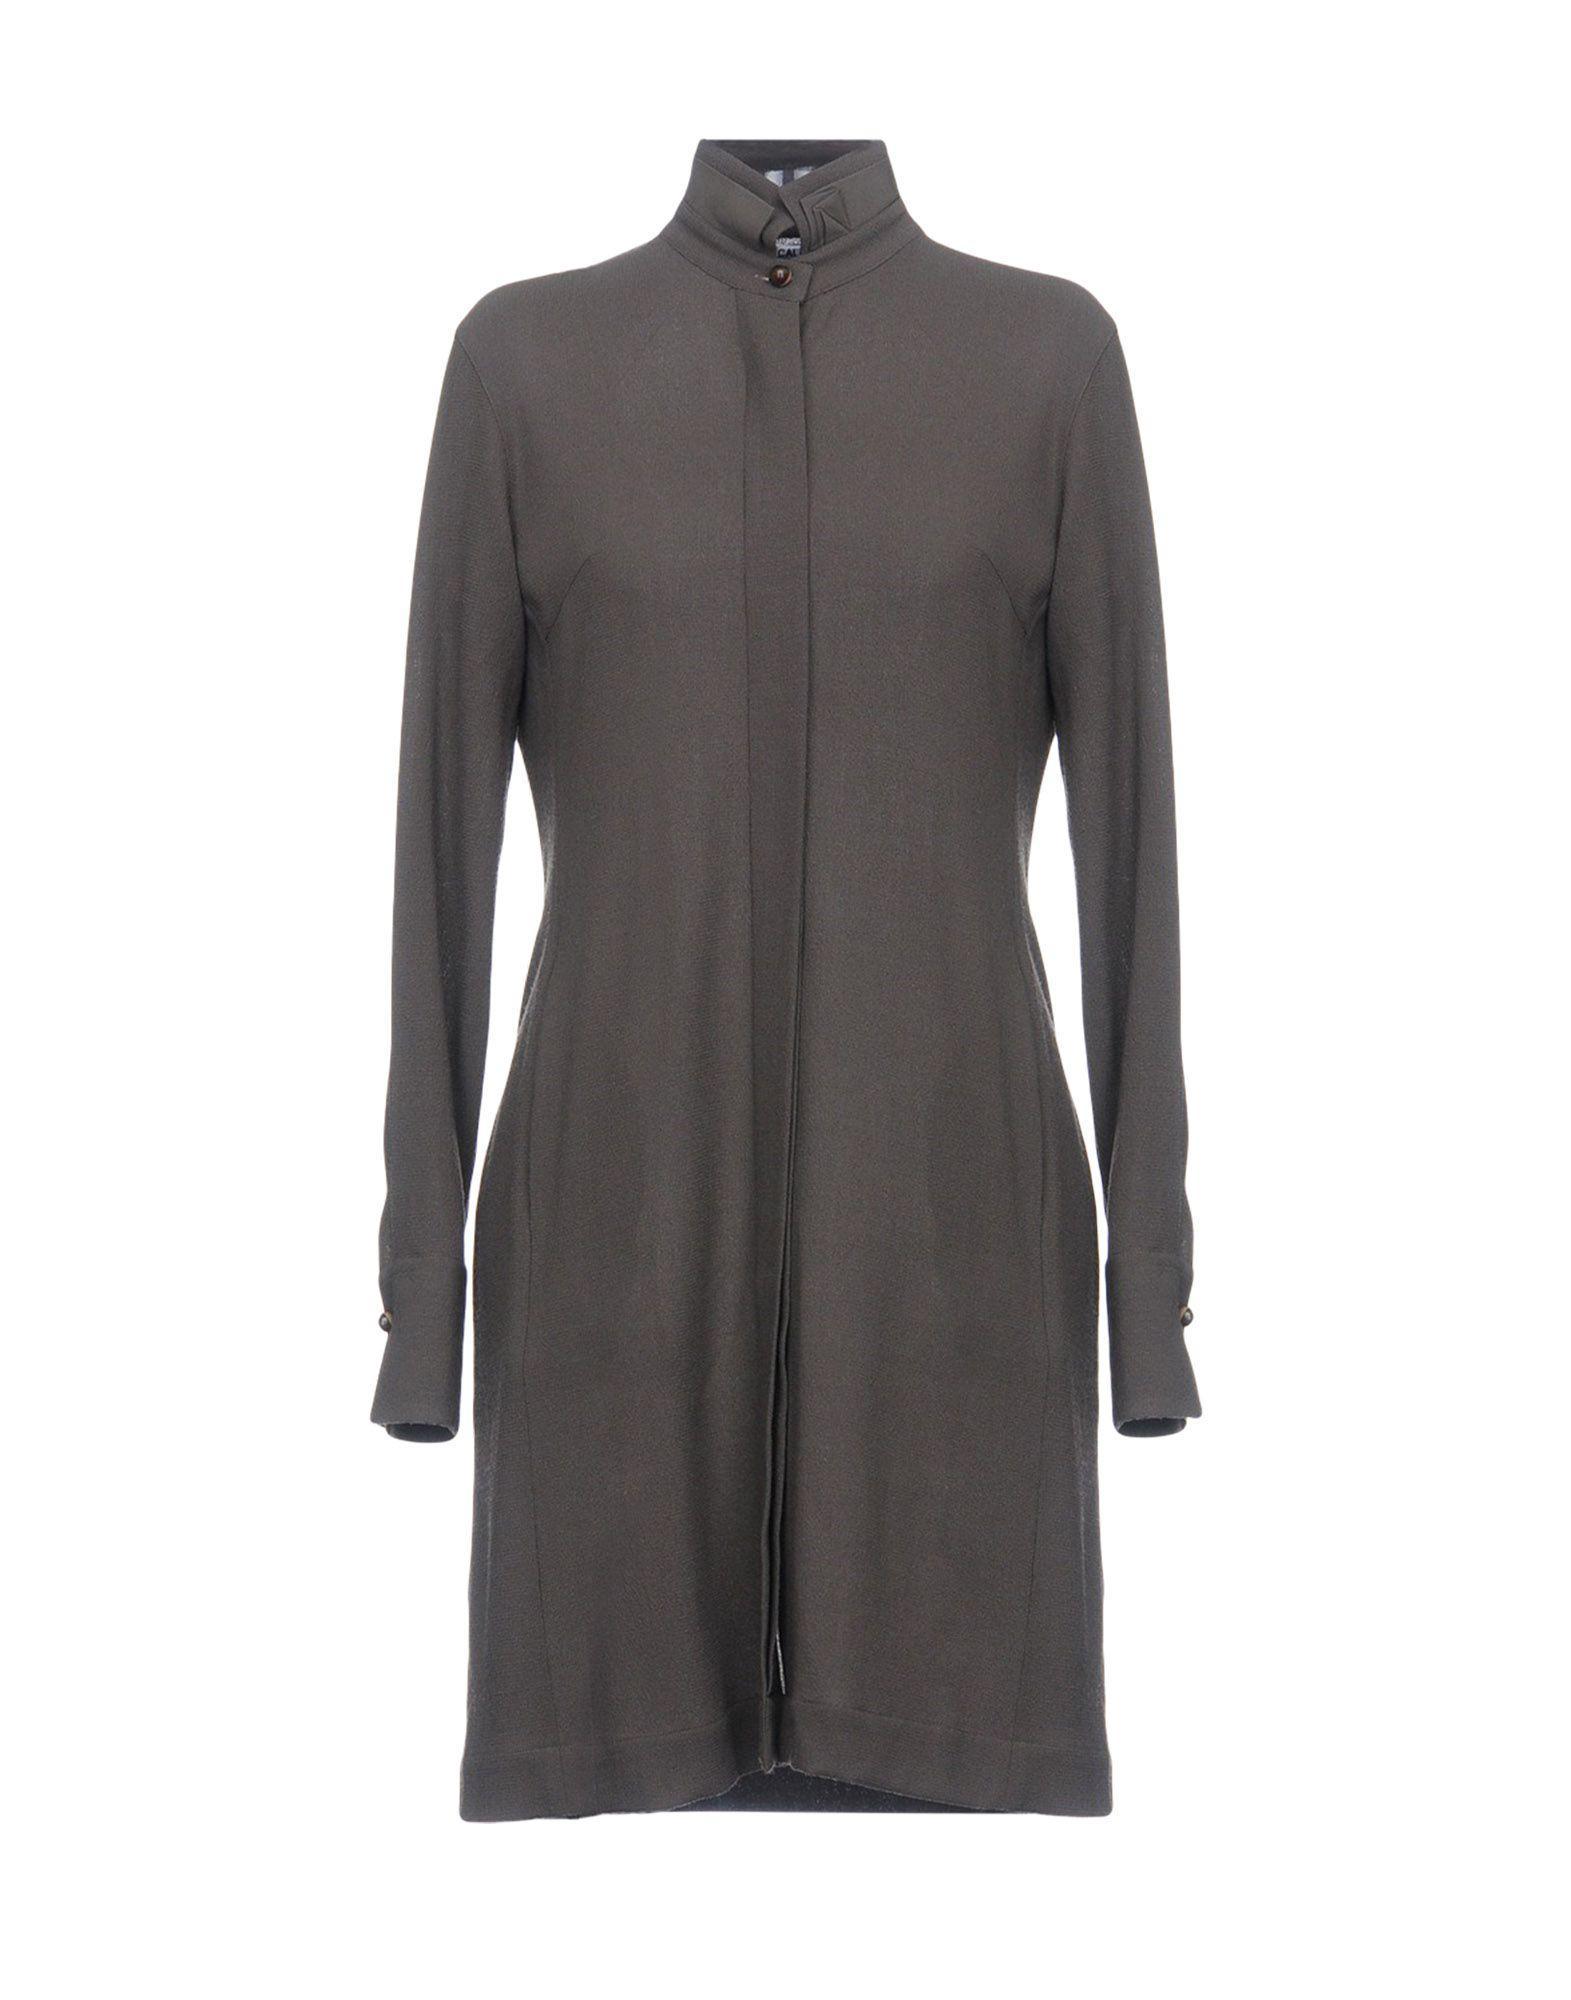 Caliban Shirt Dress In Khaki